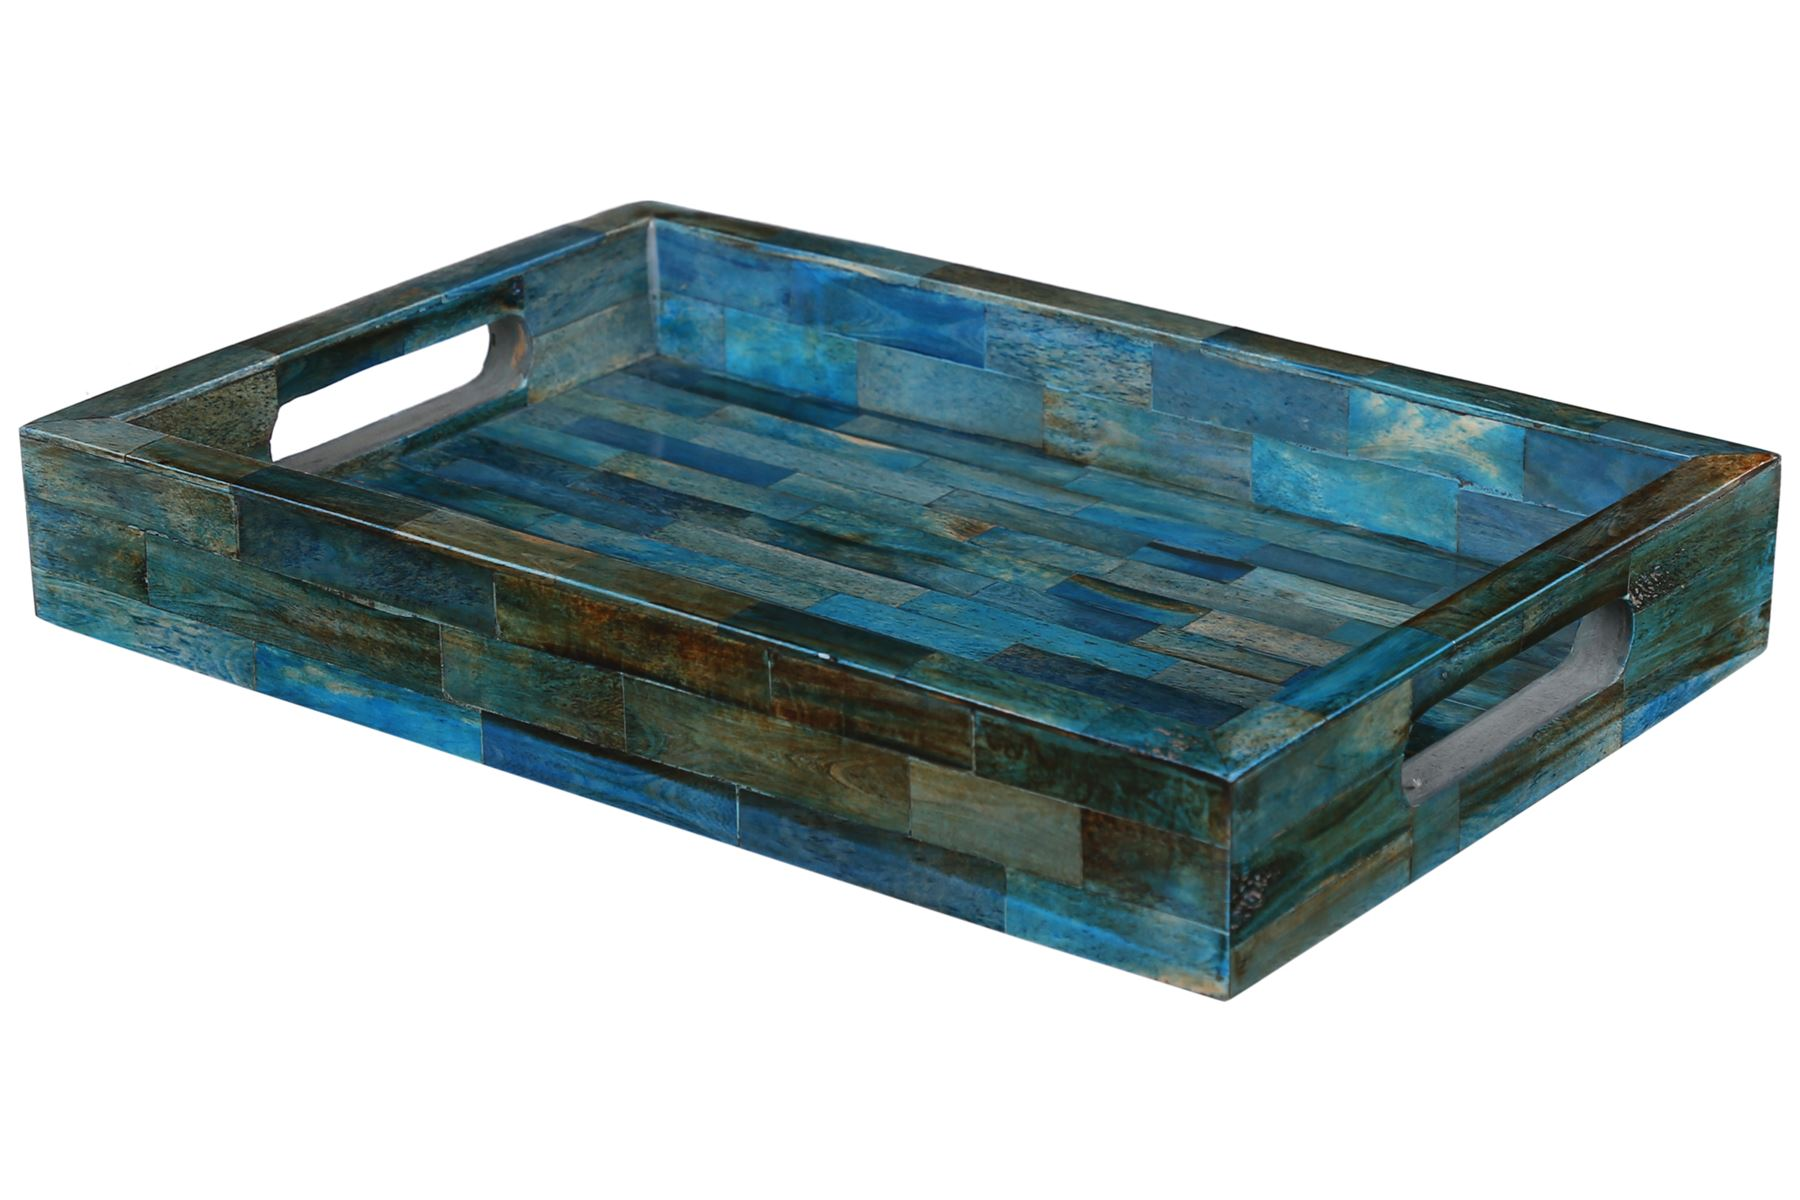 Handicrafts-Home-Verdigris-Ideal-Ottoman-Multipurpose-Serving-Decorative-Tray thumbnail 9